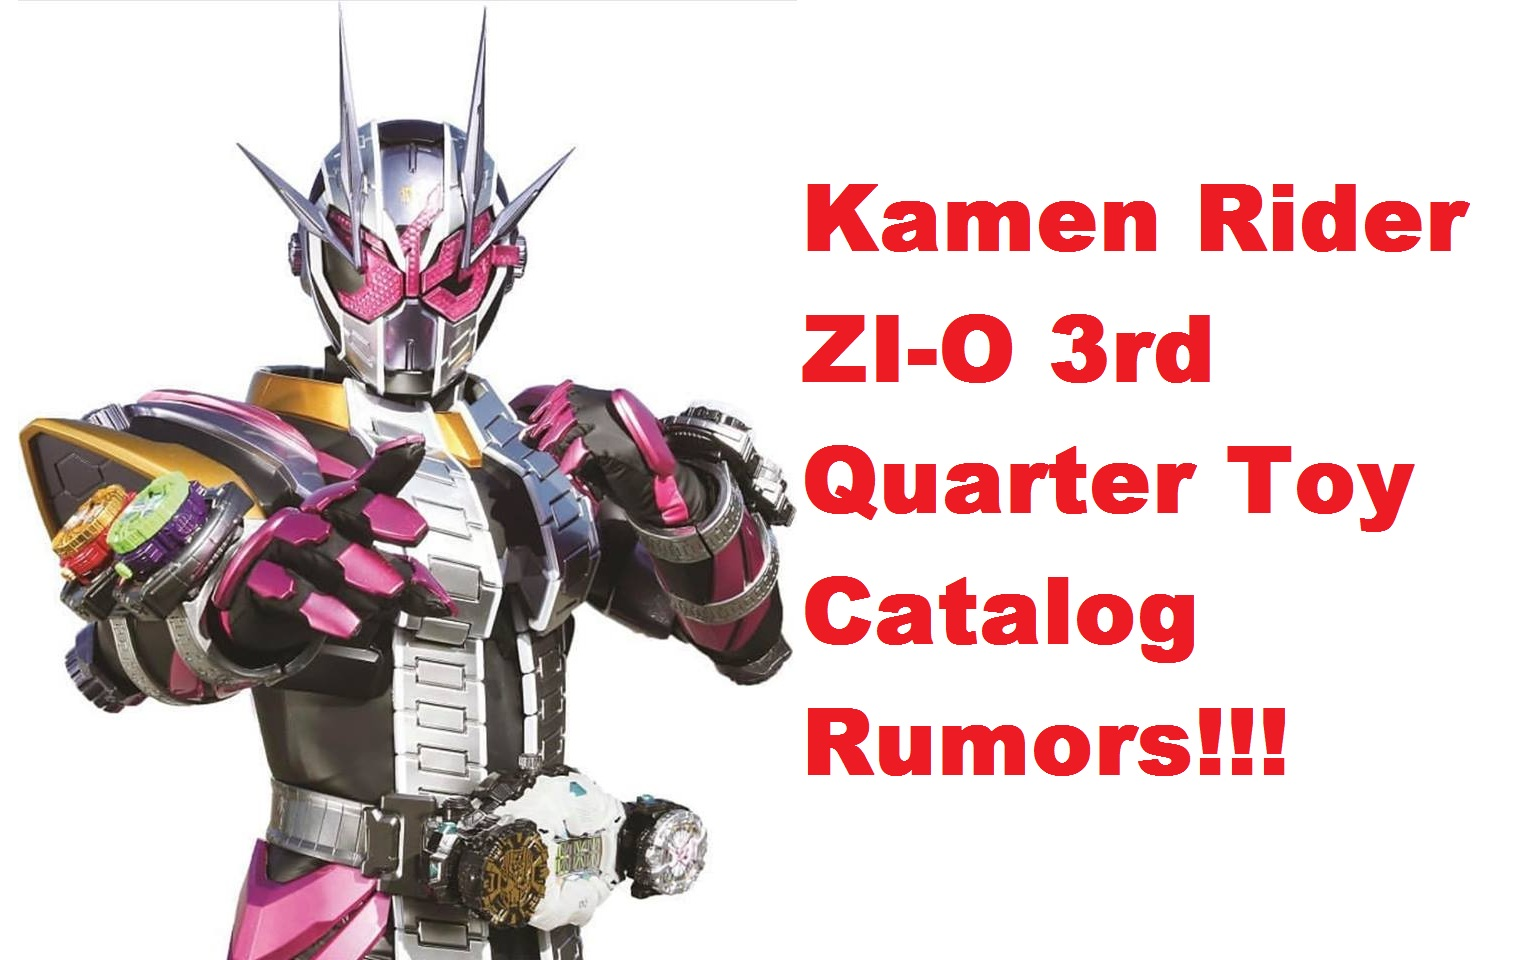 Kamen RIder ZI-O - 3rd Quarter toy Catalog Rumors Feat  New Riders